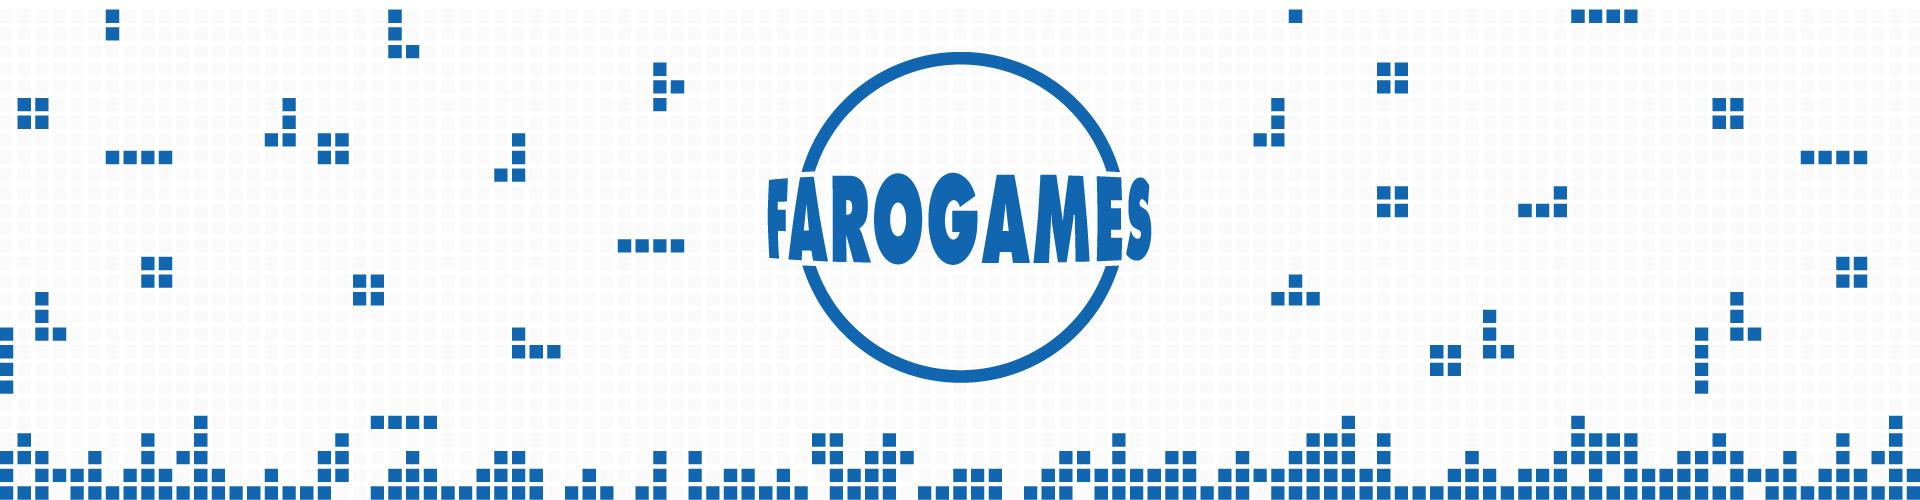 Home Farogames 2